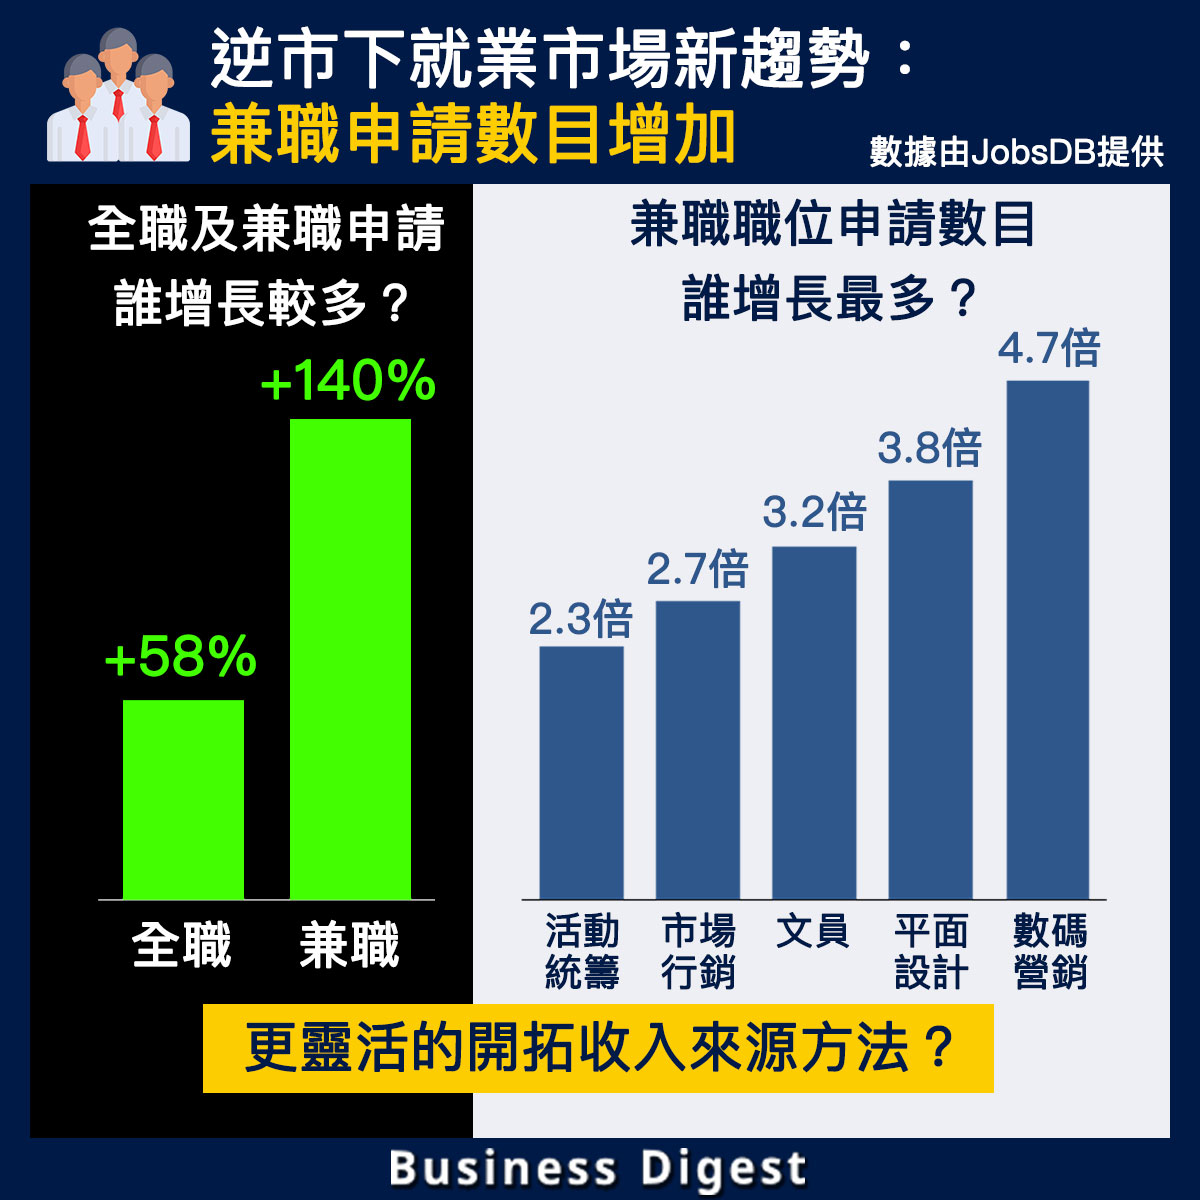 【JobsDB x Business Digest】更靈活的開拓收入來源方法?逆市下兼職申請數目大幅增加!